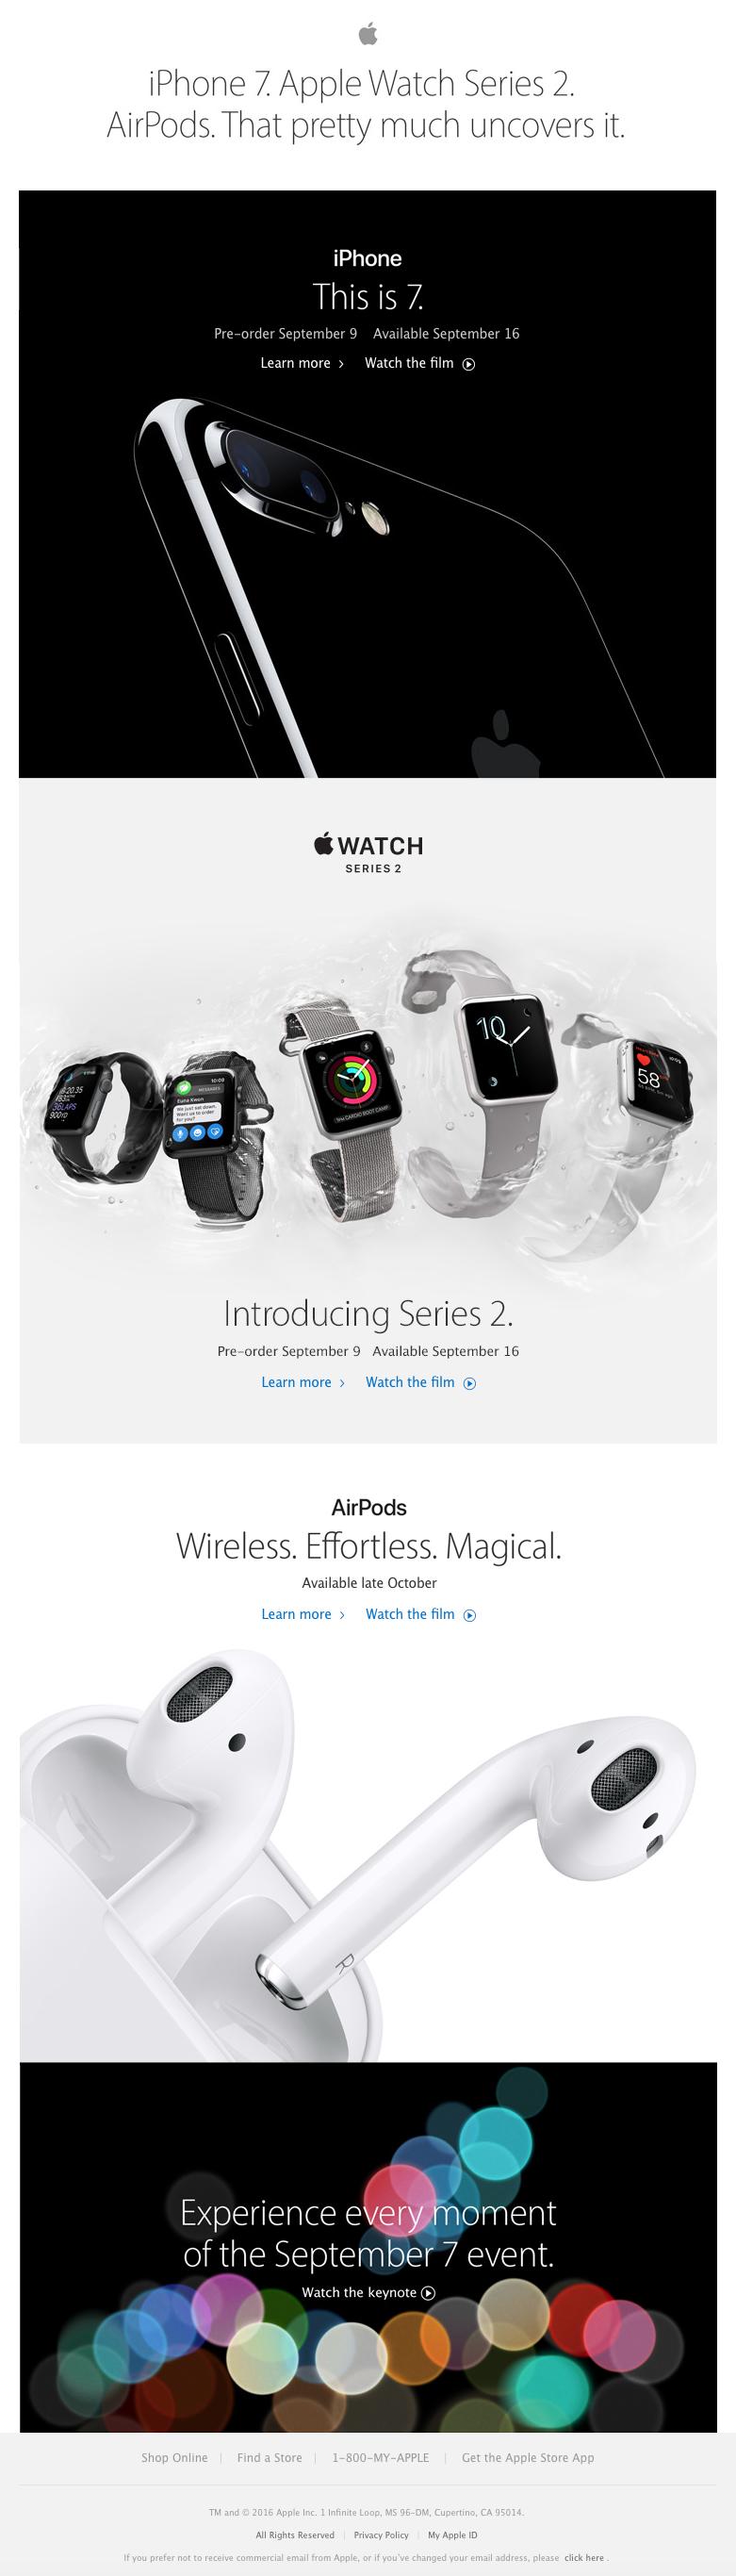 Beautiful email design from Apple | Medical Meta | Pinterest ...